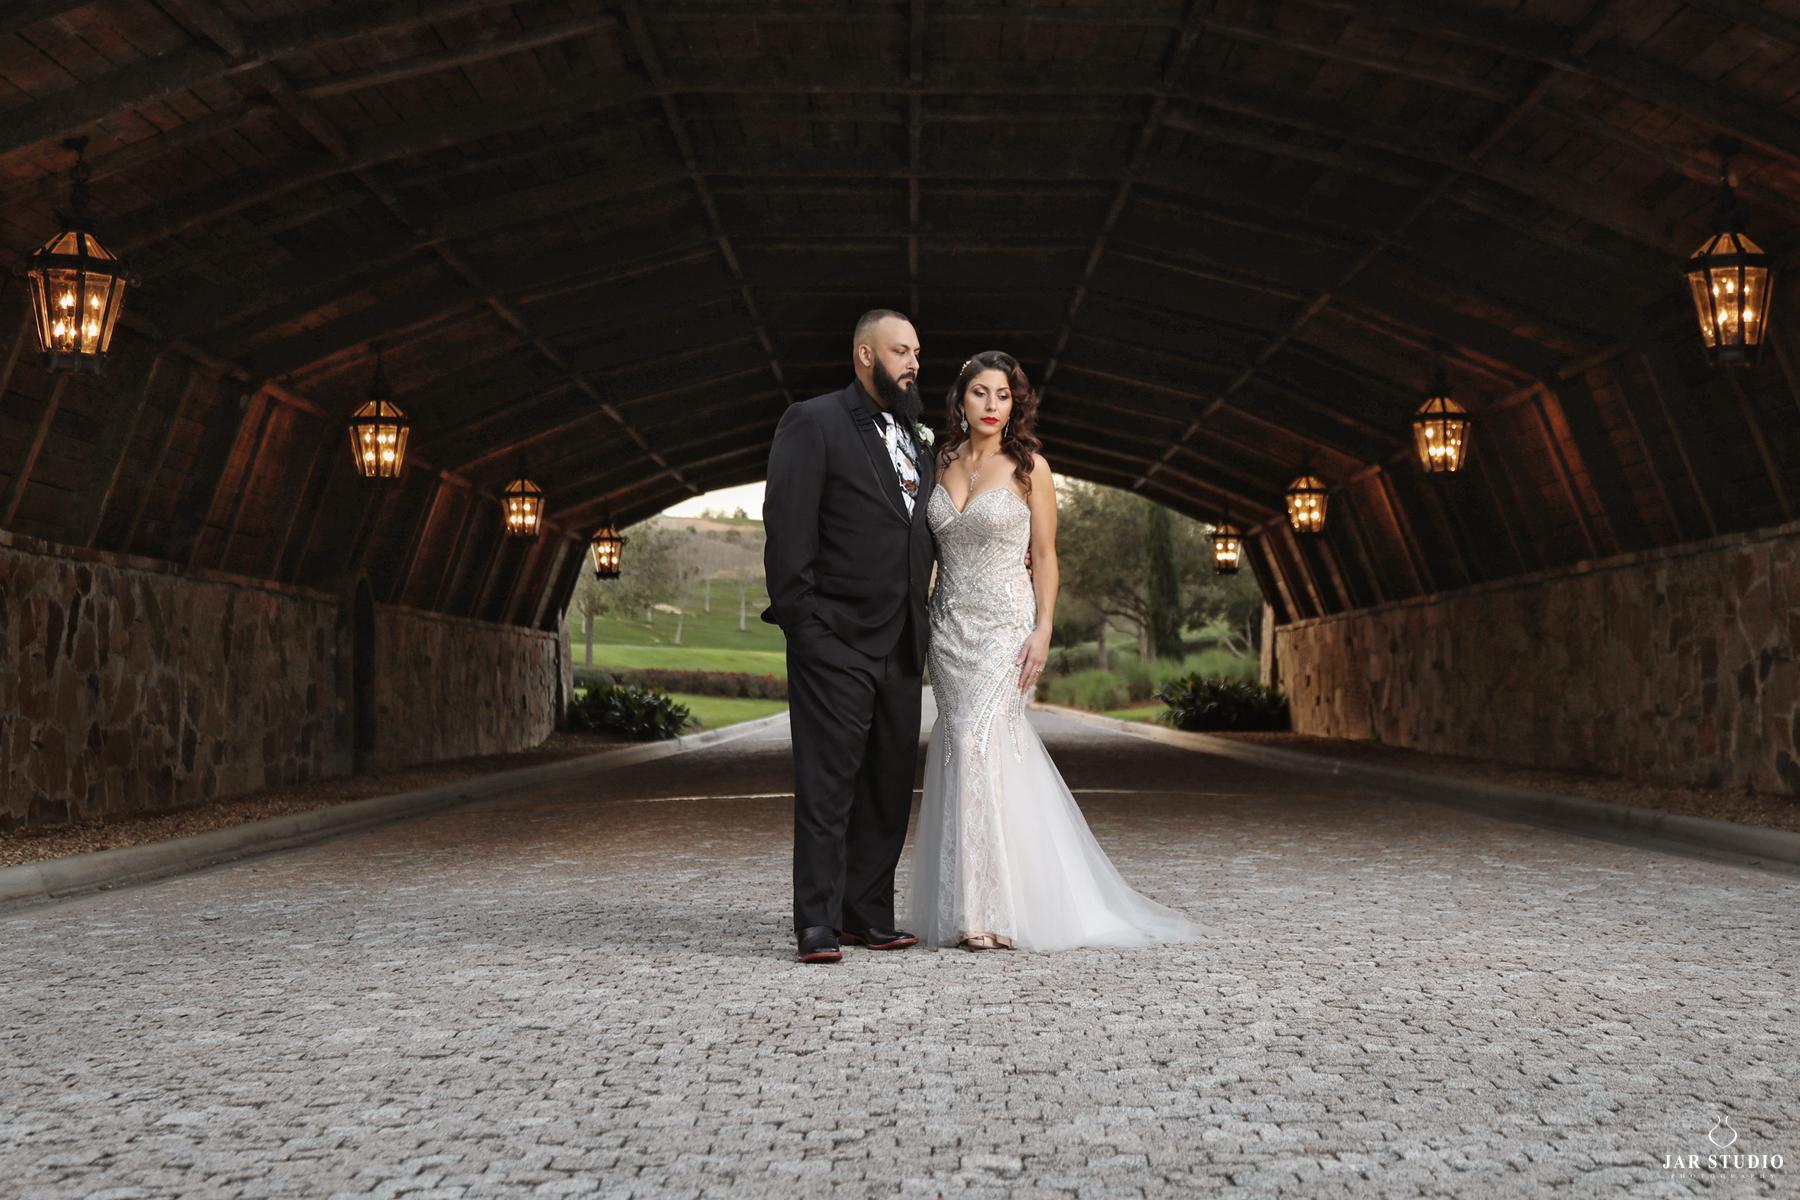 21-amazing-wedding-venue-jarstudio.jpg